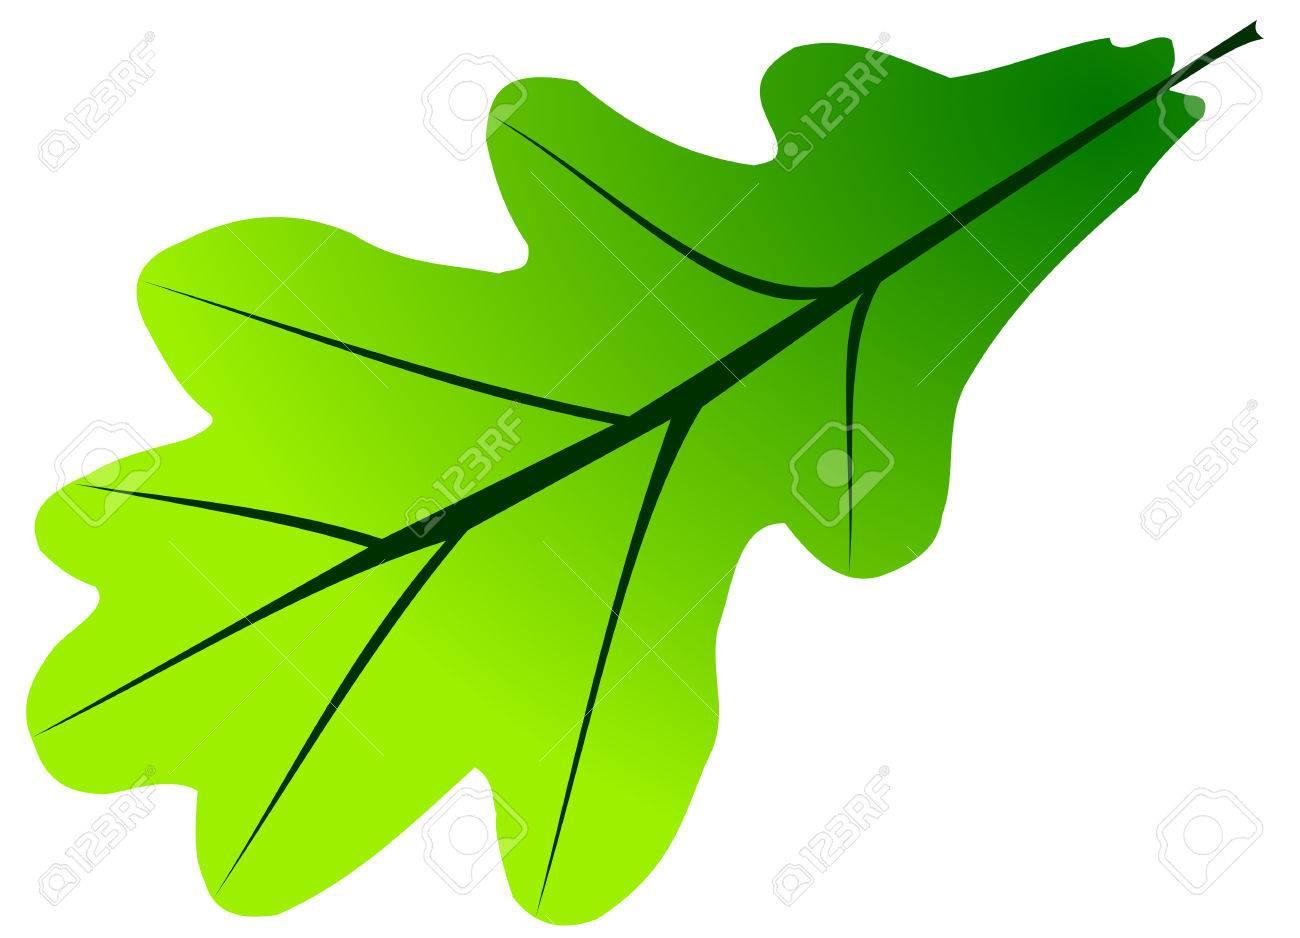 oak quercus robur vector isolated oak leaf royalty free cliparts rh 123rf com oak leaf silhouette vector oak leaf vector free download